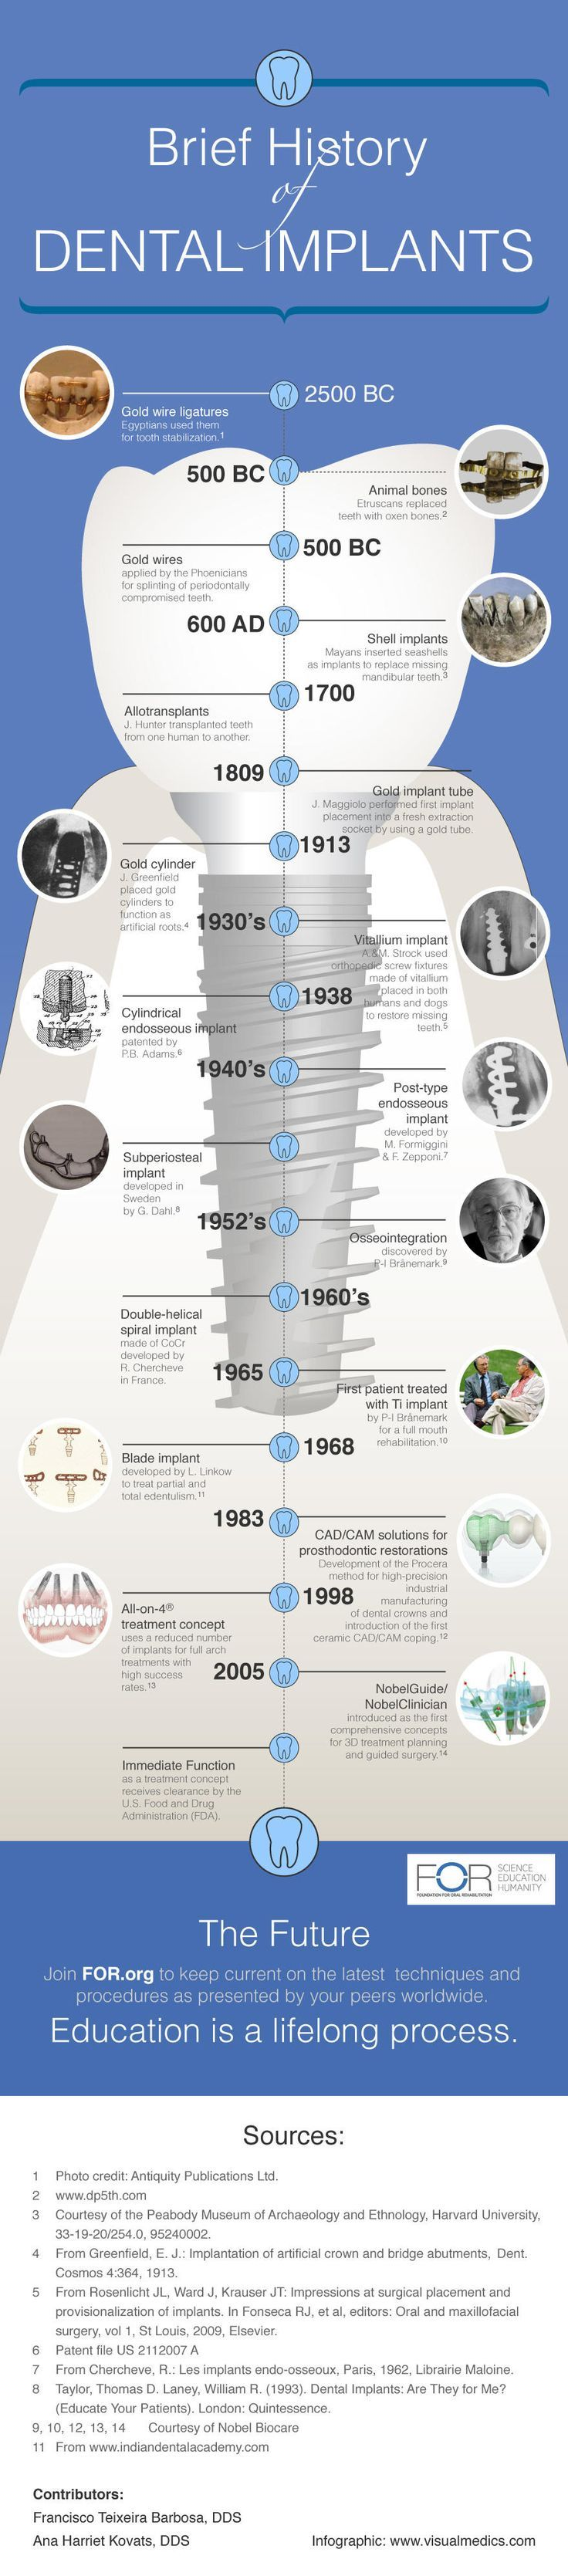 Dental Implants History #dentalimplants #dentistry #dental,#healthy Smile, # Hyderabad,charminar